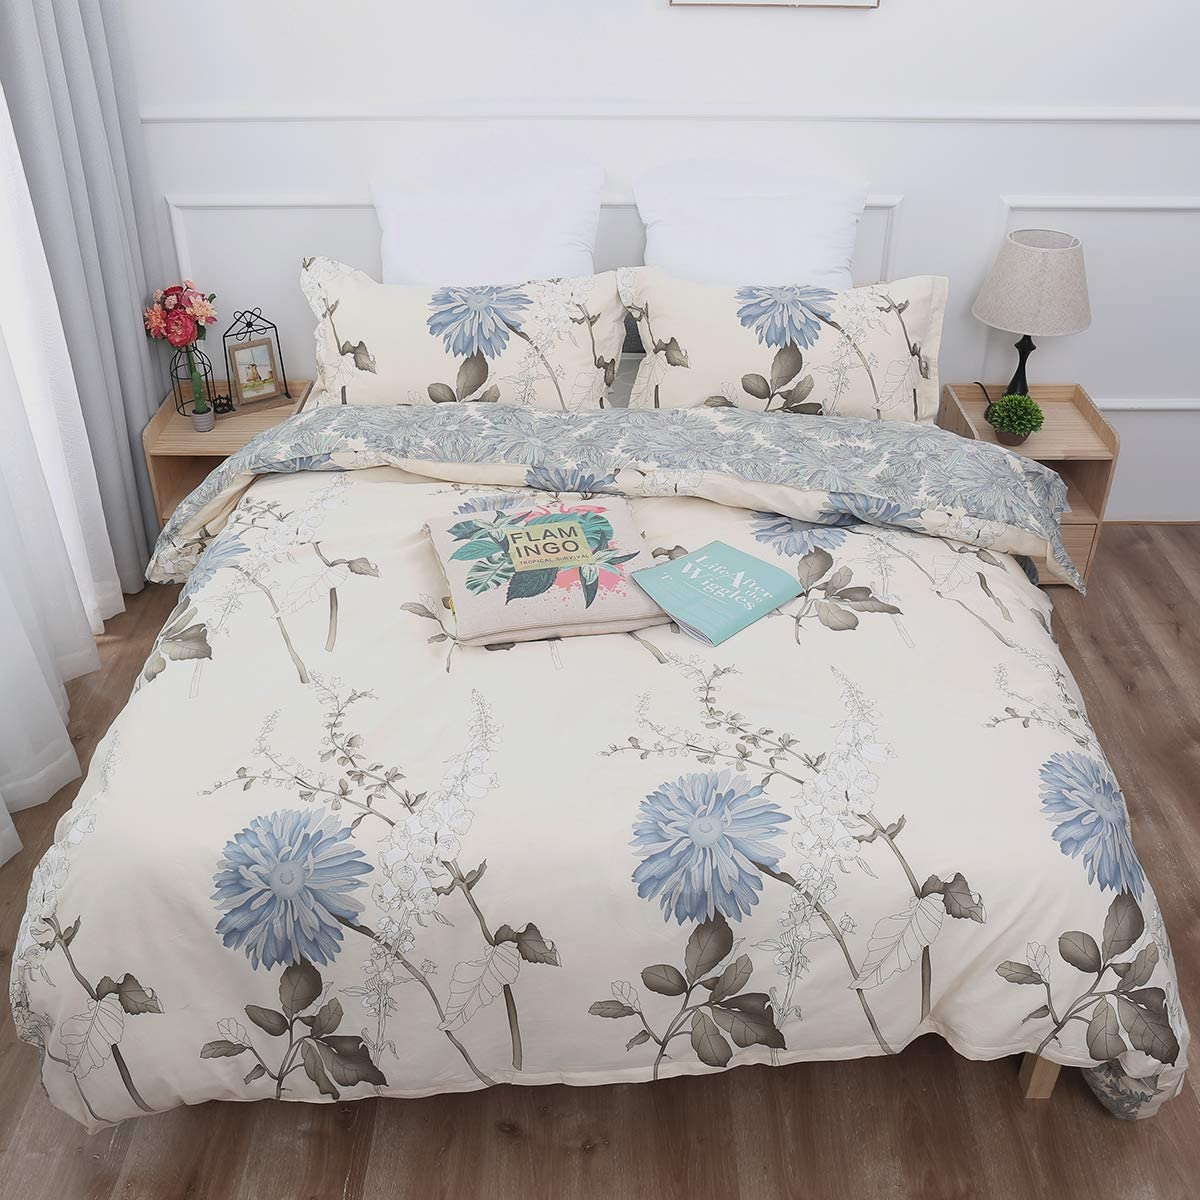 Goodidea Vintage Floral Comforter Set Queen 3 Pieces, Botanical Floral Print Bedding Set, Soft Breathable Comforter for All Season